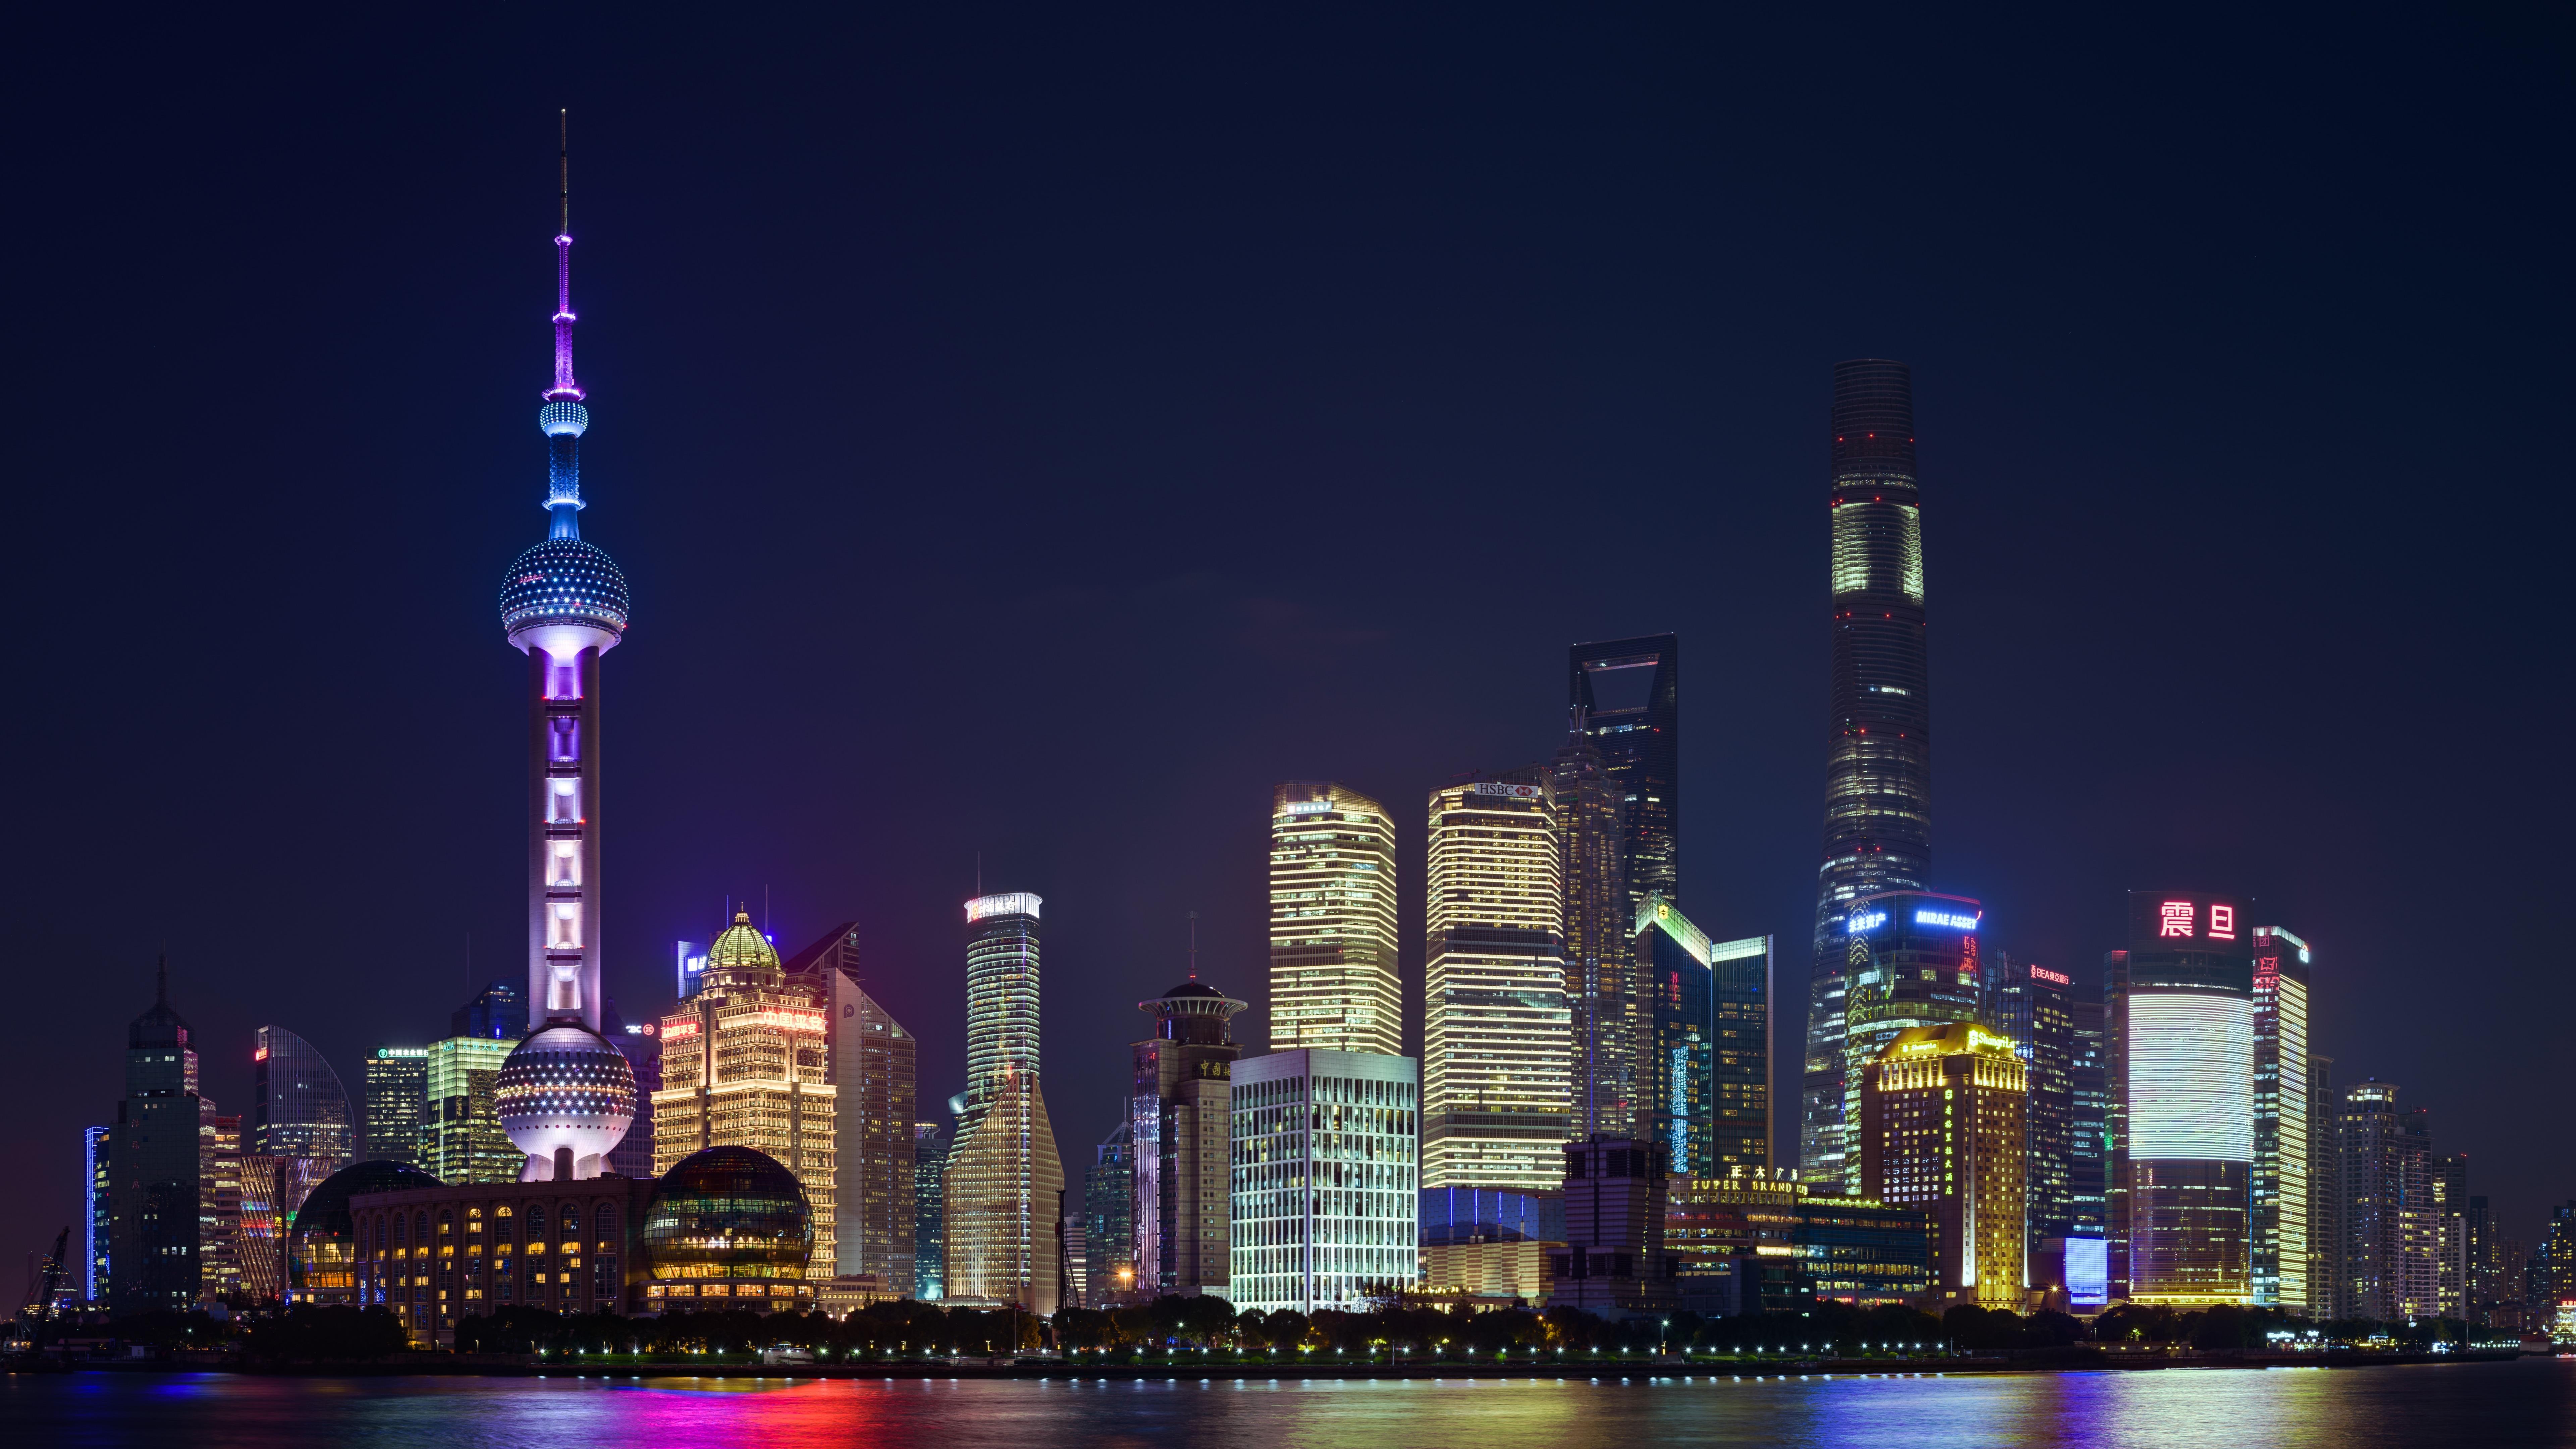 Pudong Nighttime Skyline wallpaper